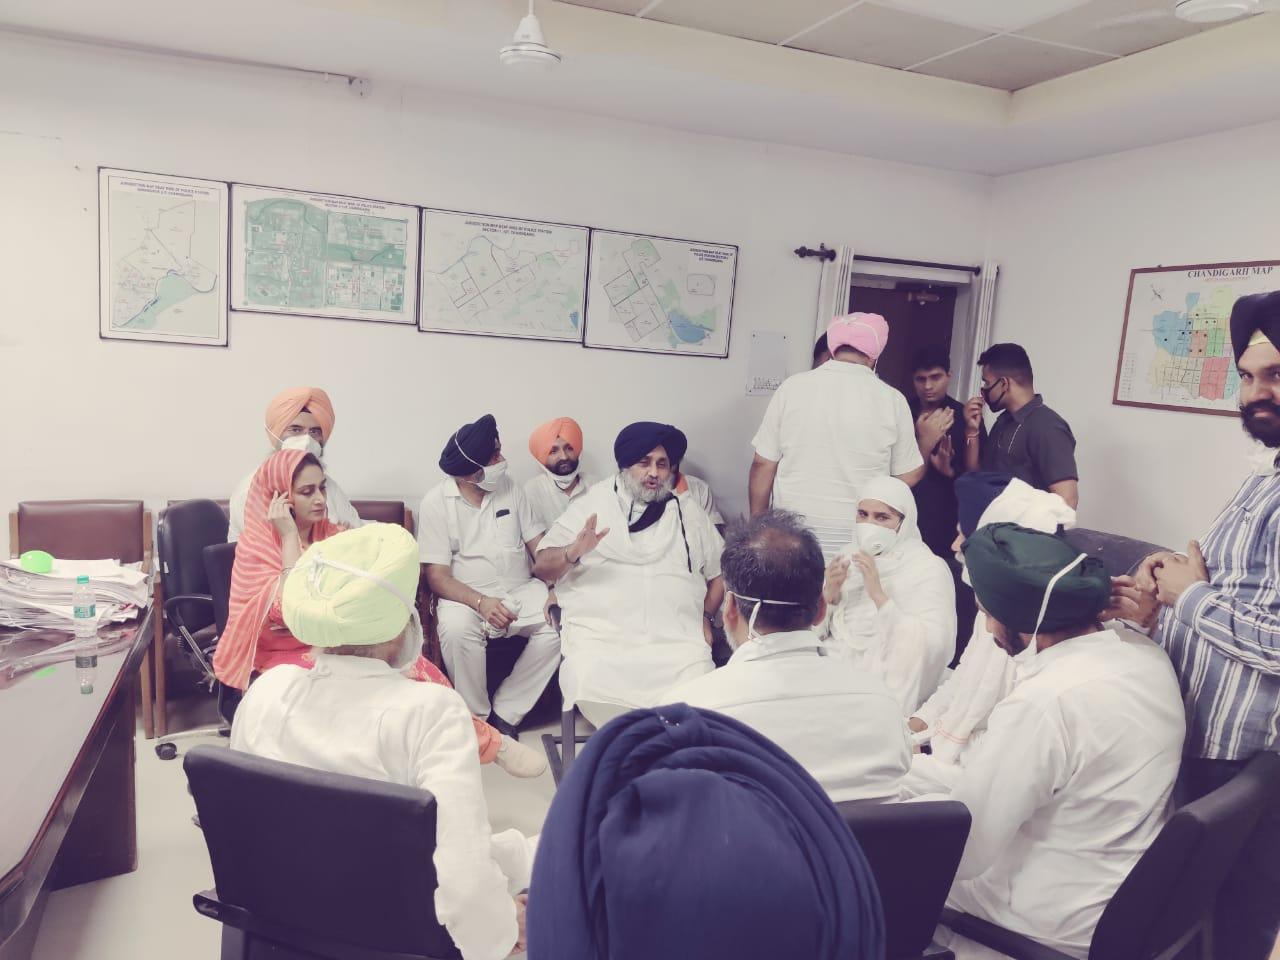 Sukhbir Singh Badal, Harsimrat Kaur Badal among others inside the Sector 17 police station